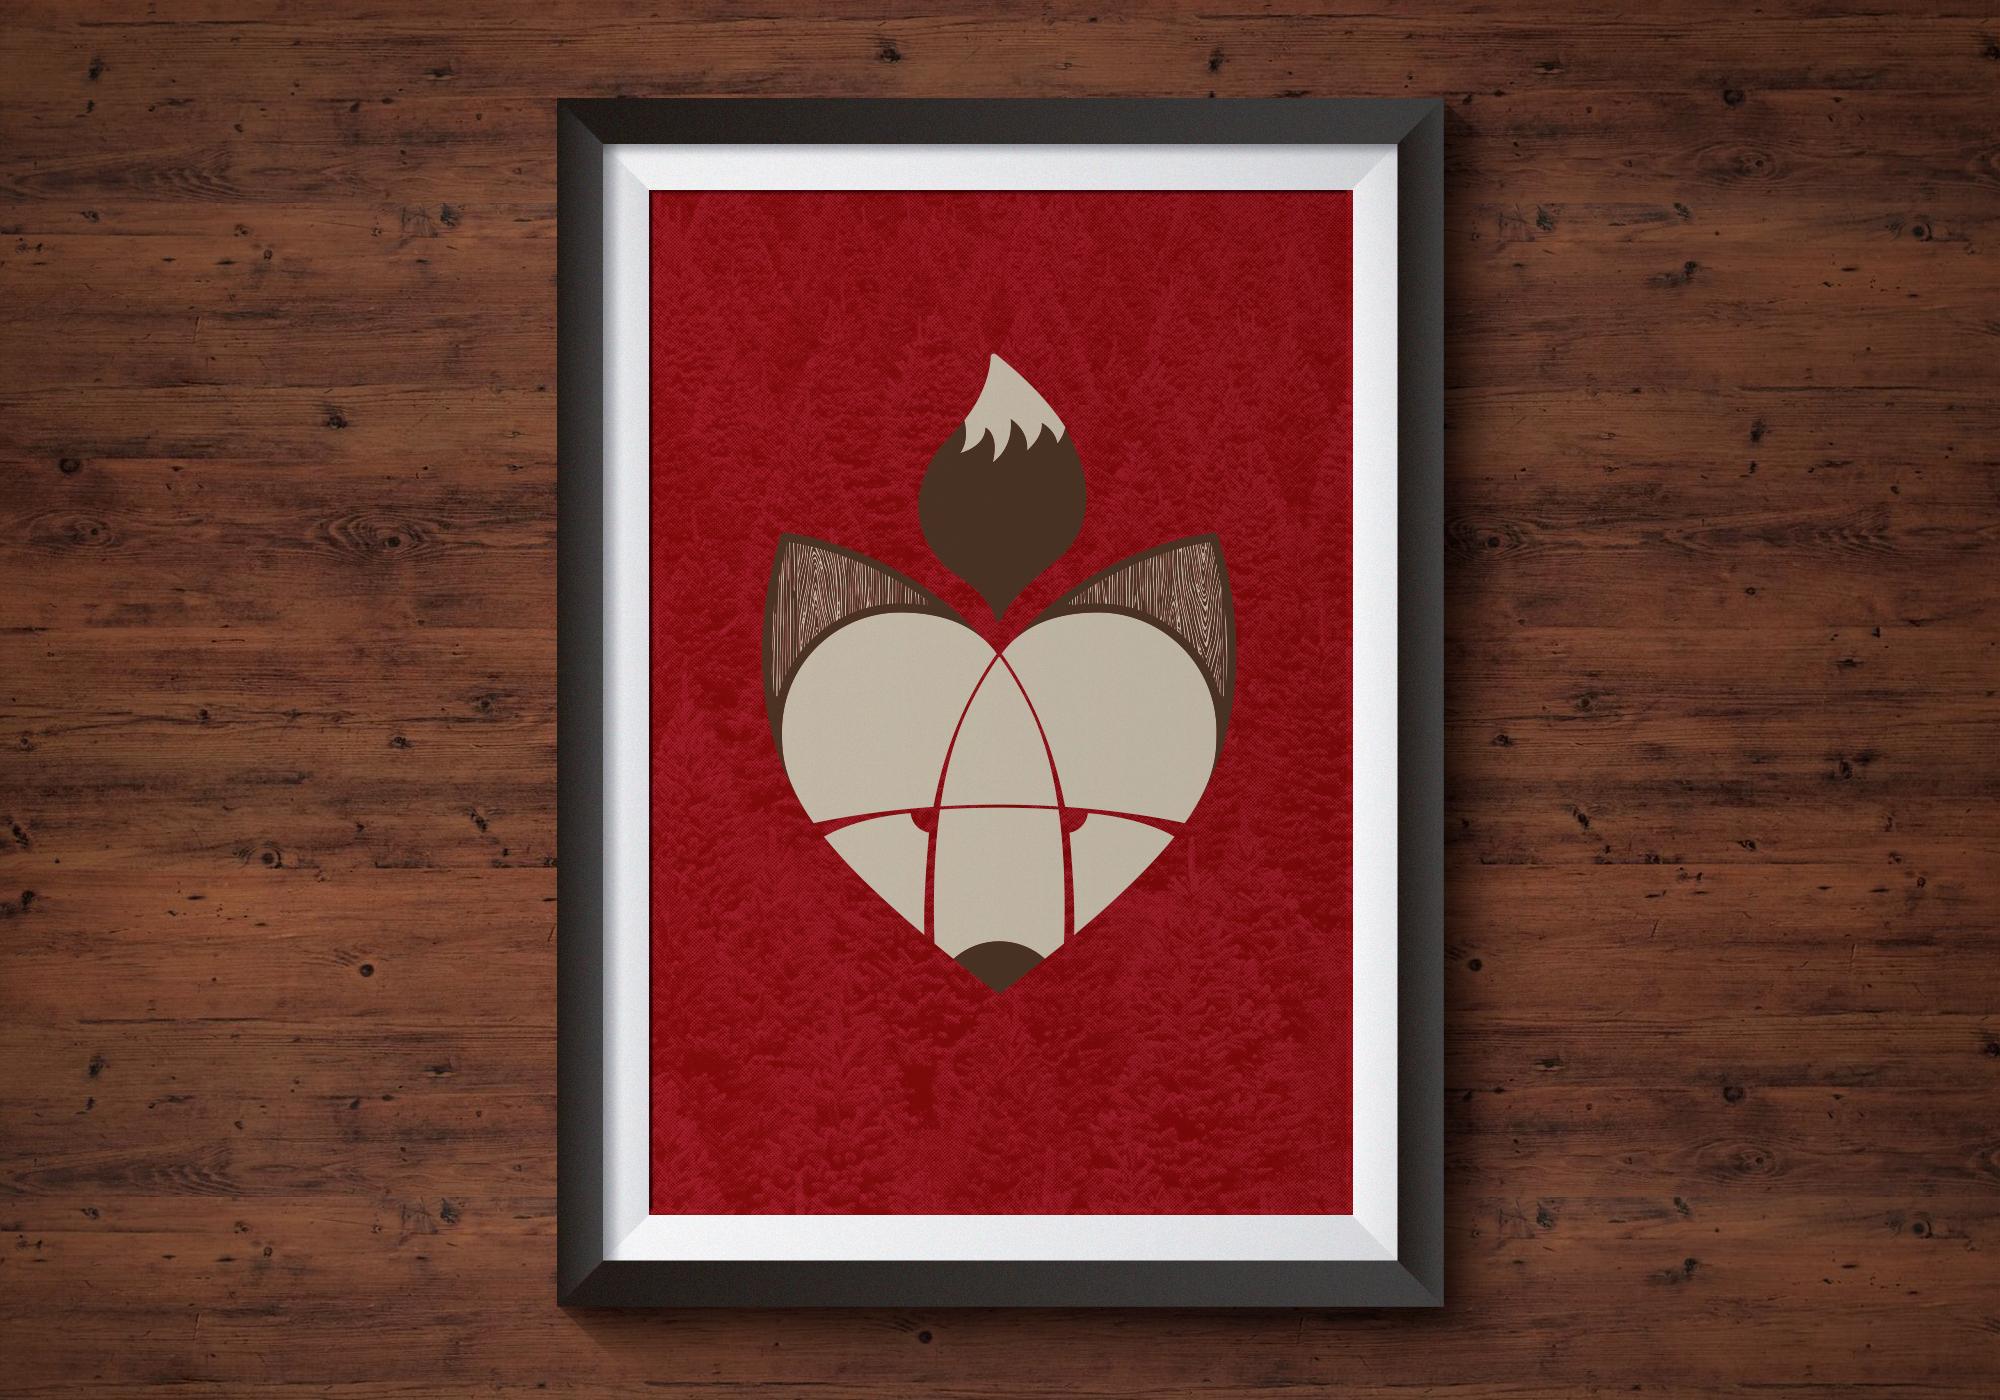 Fox_ArtShow_Poster.jpg